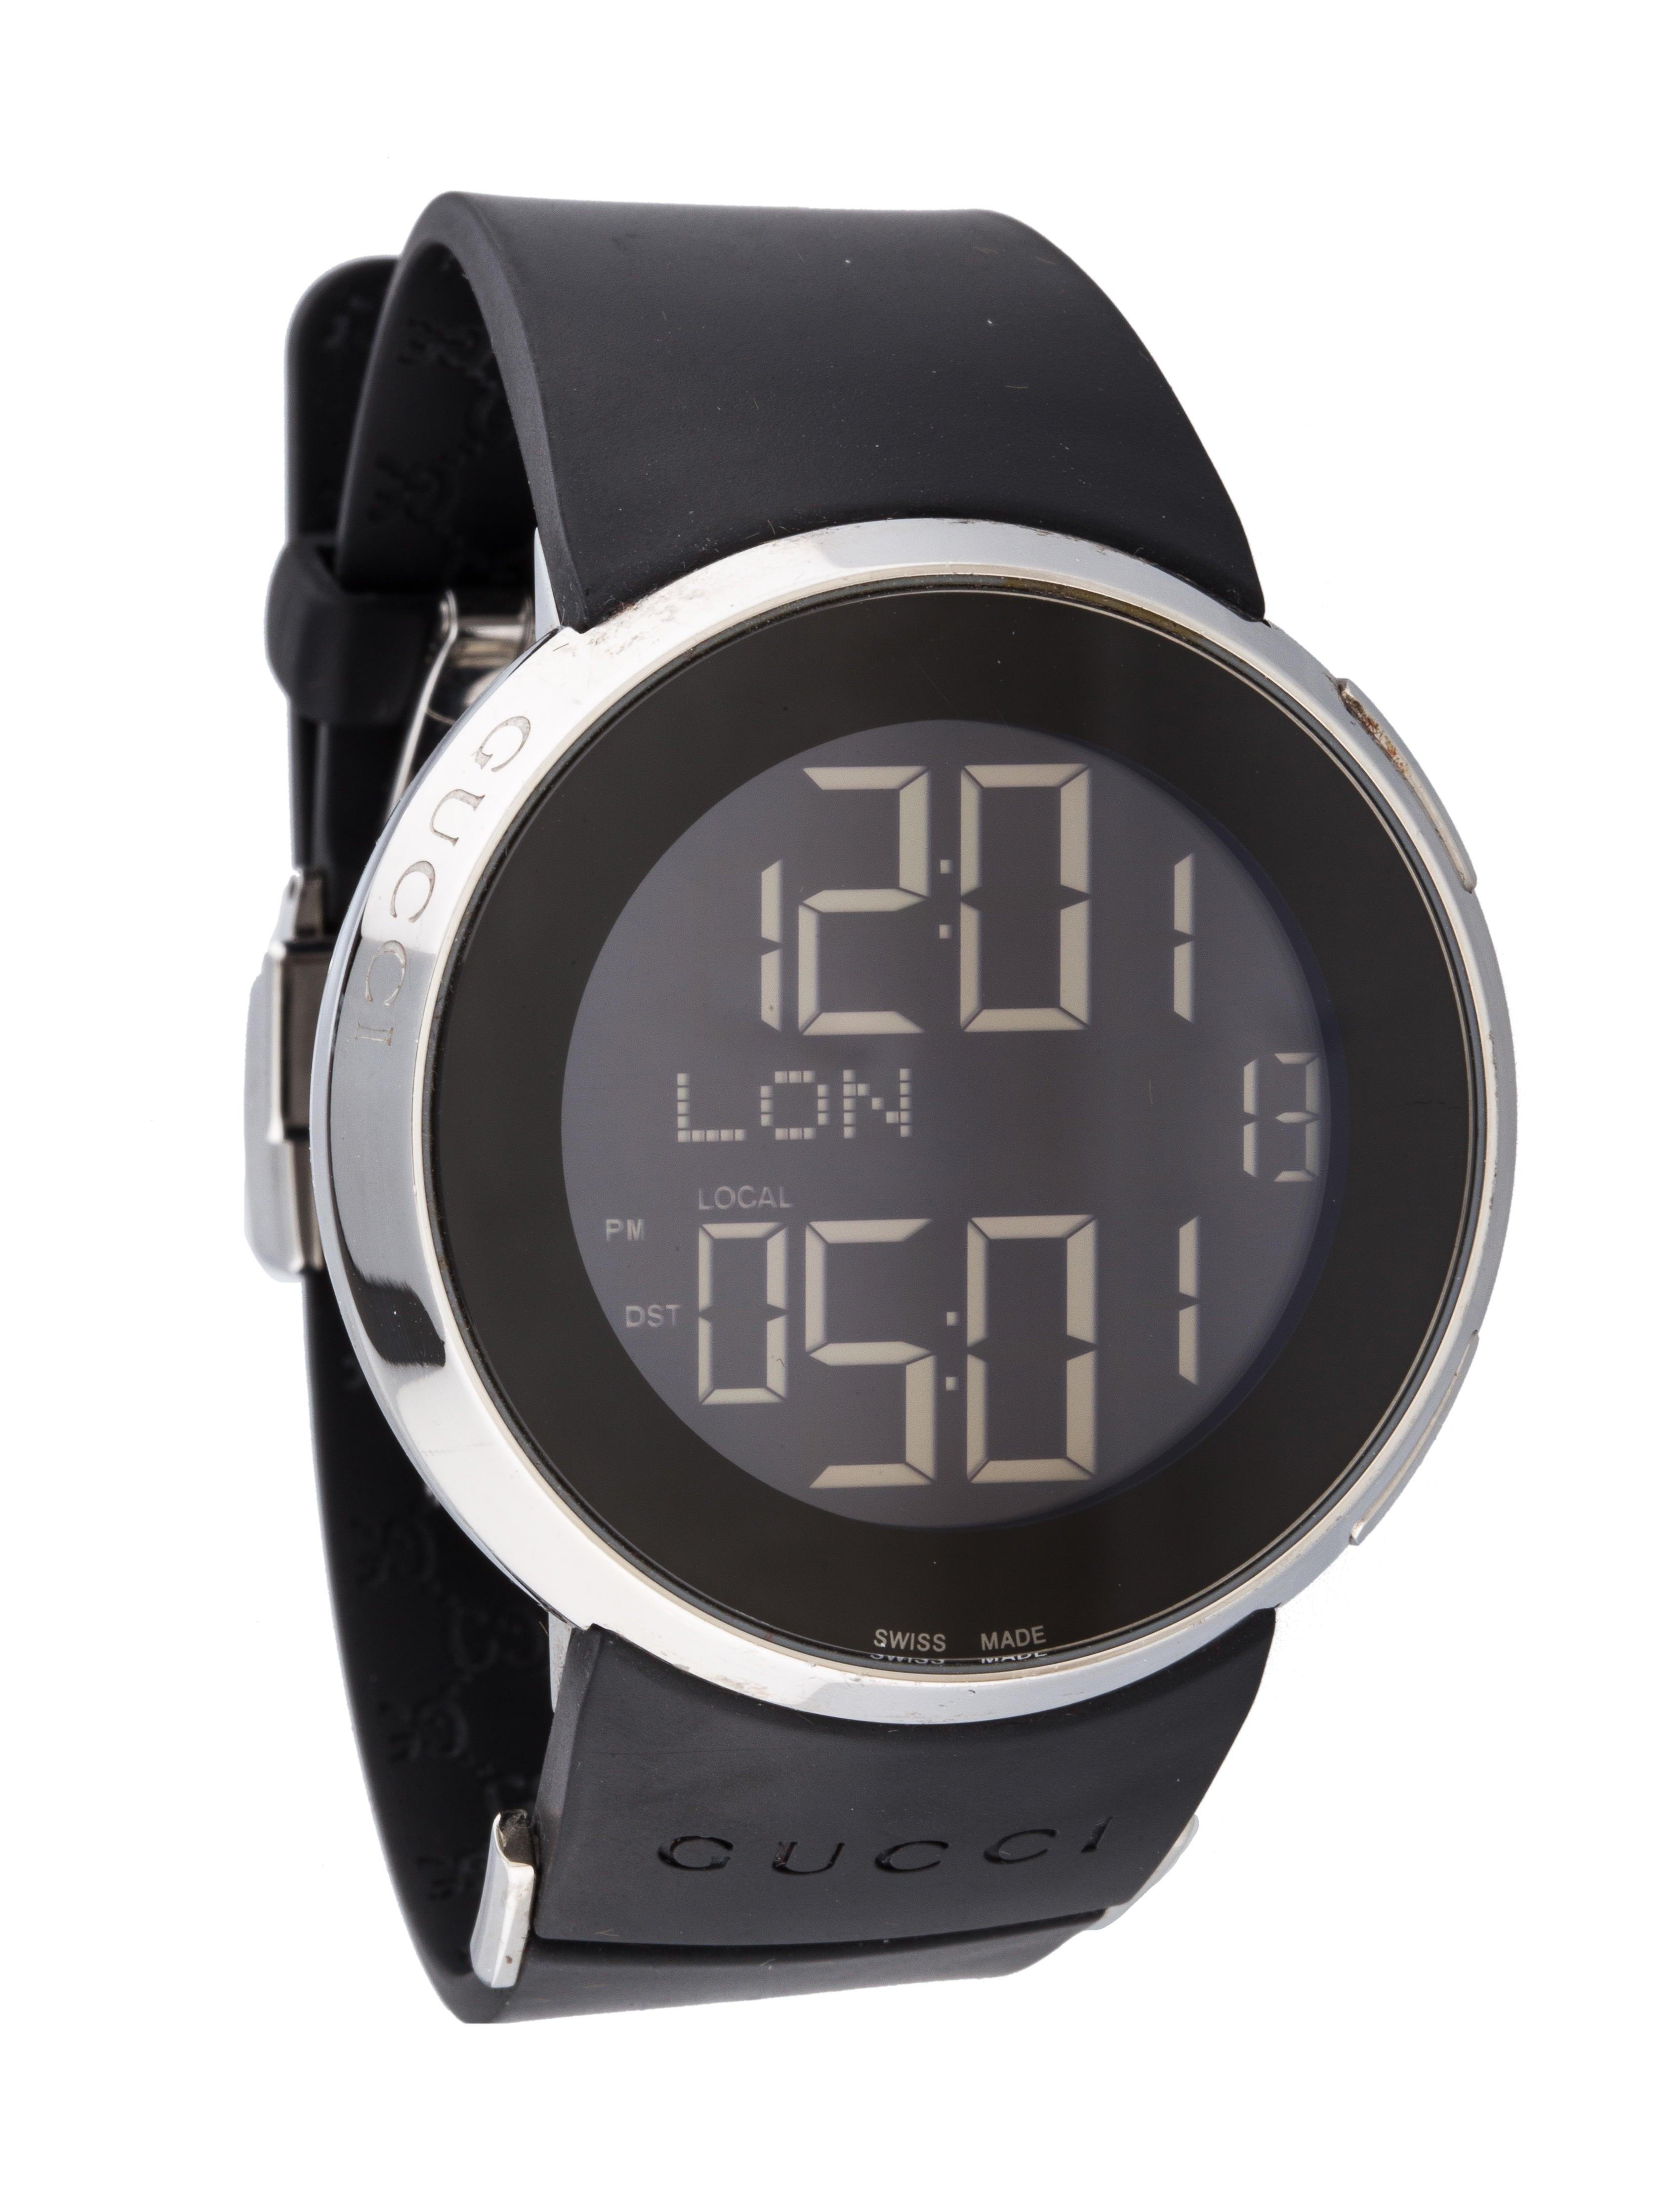 189b3922d6d Gucci Digital Watch YA114202 - Bracelet - GUC45151